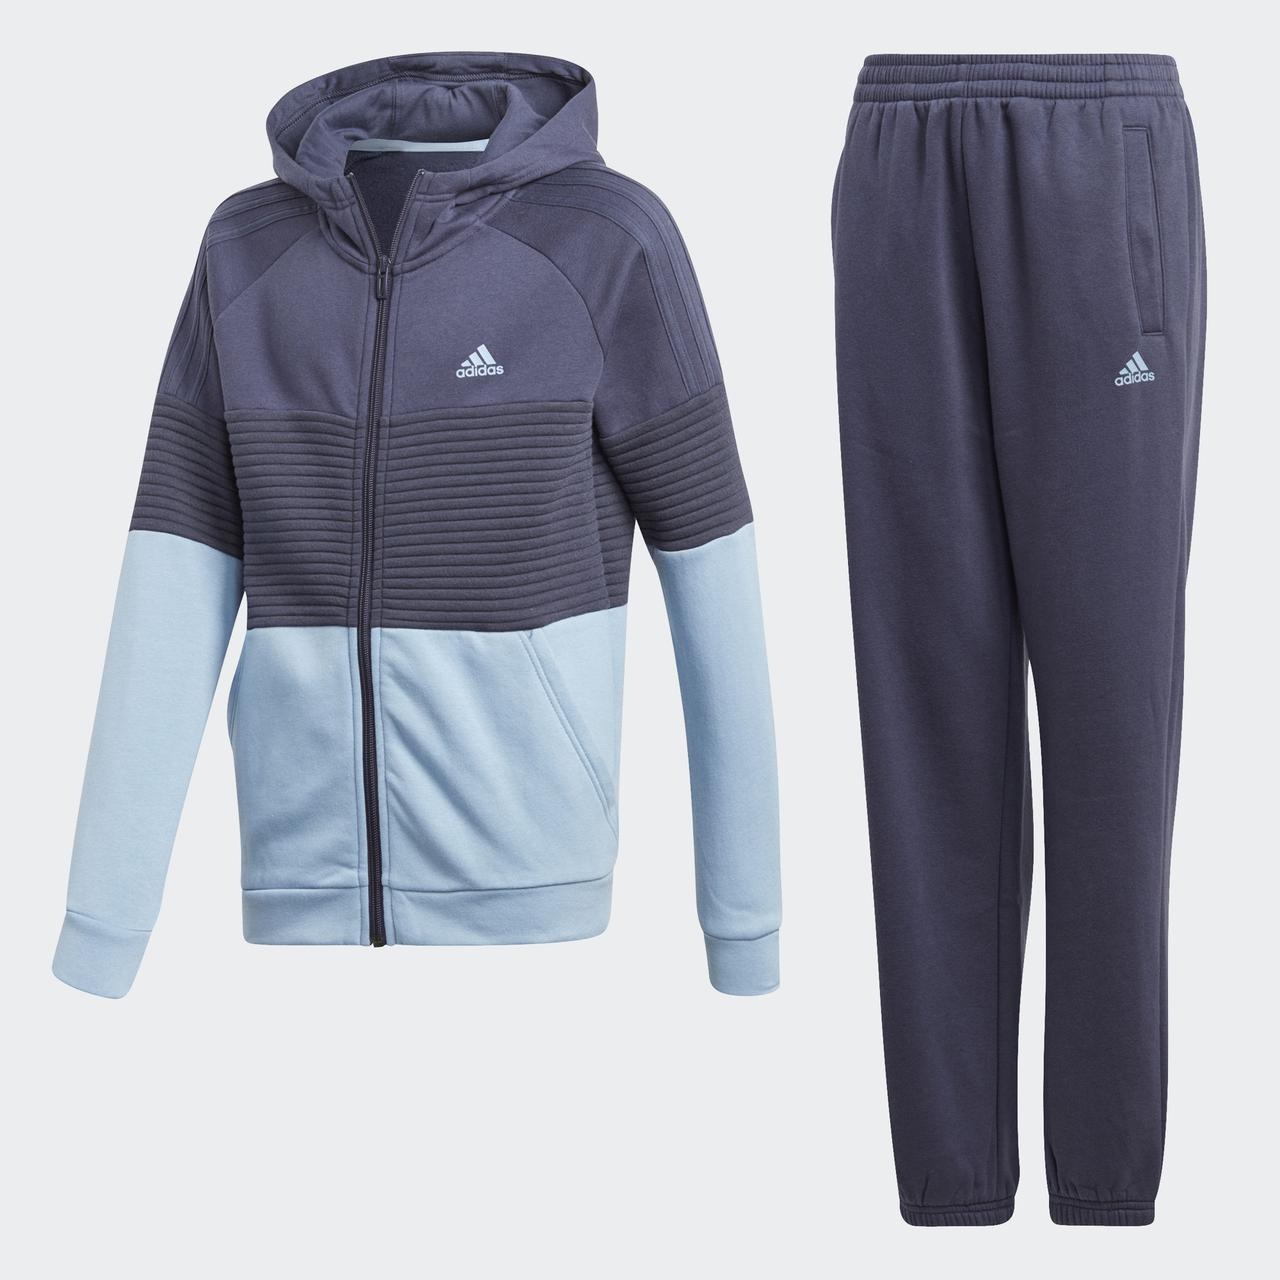 9364ba3f Купить Детский спортивный костюм Adidas Performance Hojo (Артикул ...